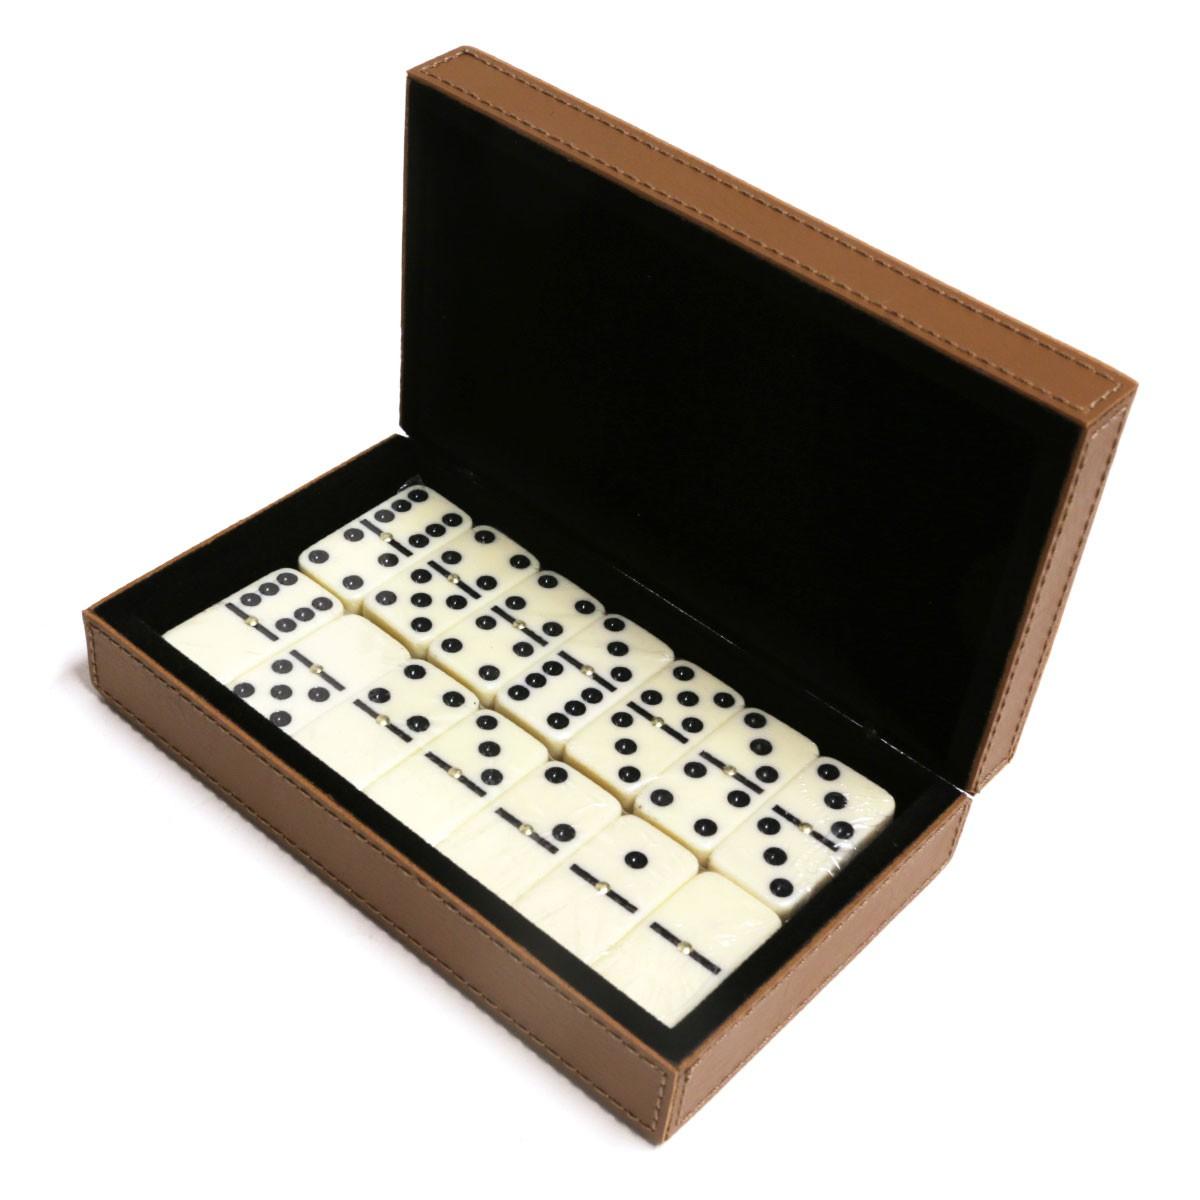 Caixa de dominó (Montana Havana)